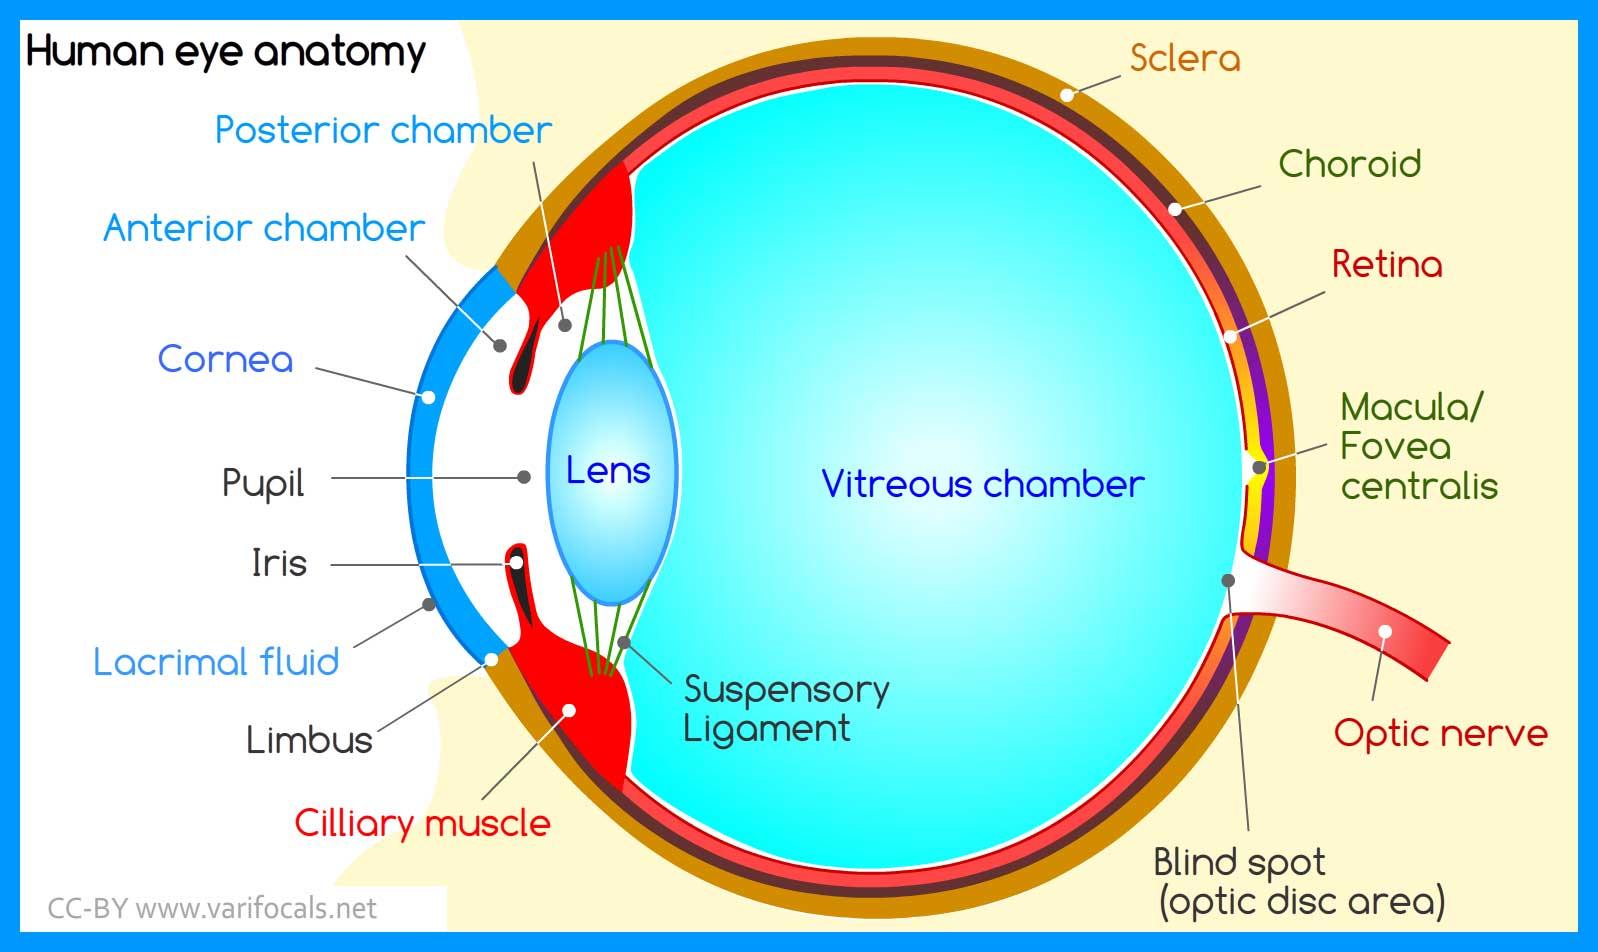 hight resolution of human eye diagram pdf wiring diagram expert human eye anatomy structure and function human eye